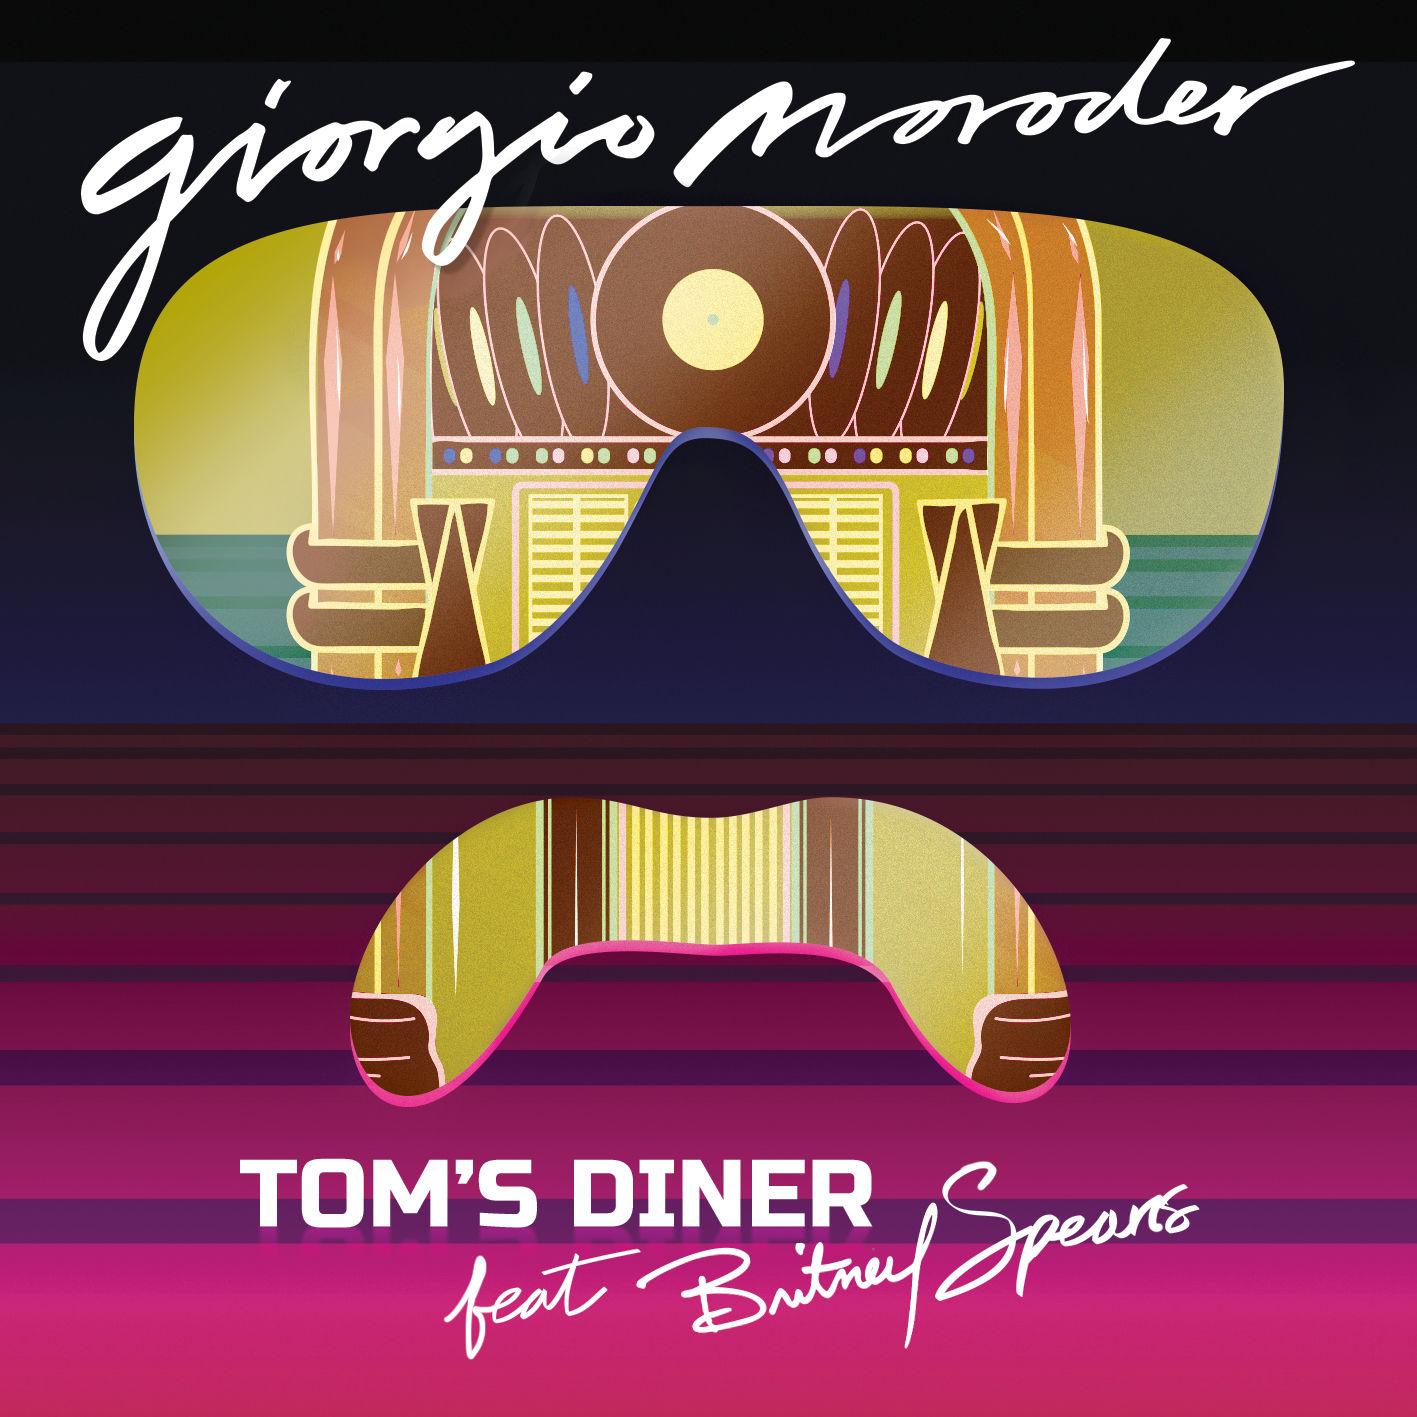 Giorgio Moroder Feat. Britney Spears - Tom's Diner (Single) (2015)